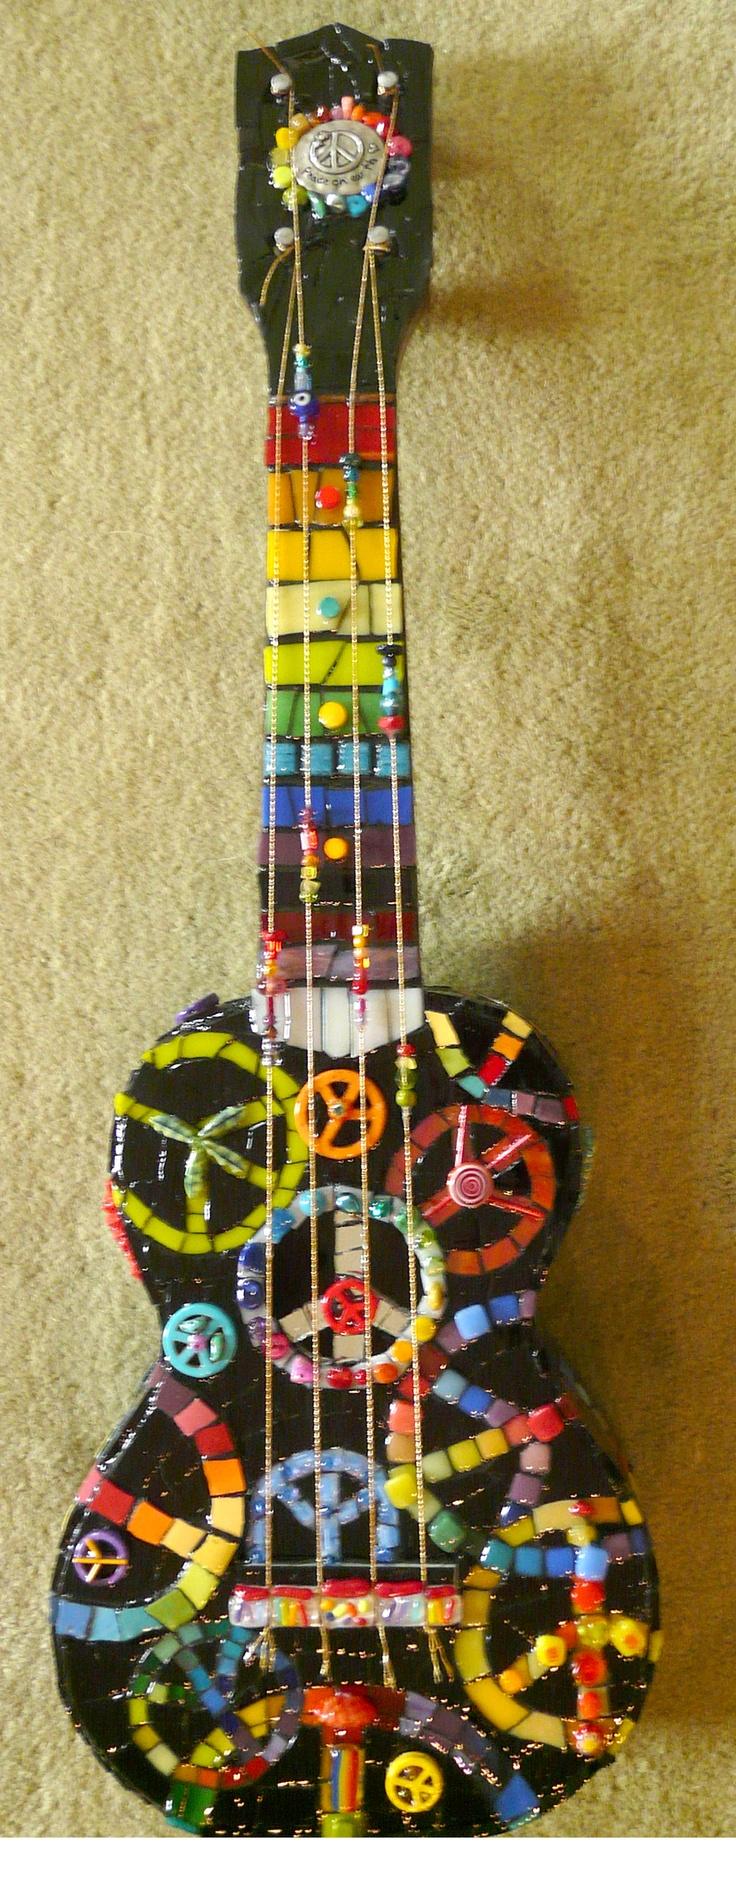 252 best Guitars Mosaic images on Pinterest | Guitars, Mosaic art ...